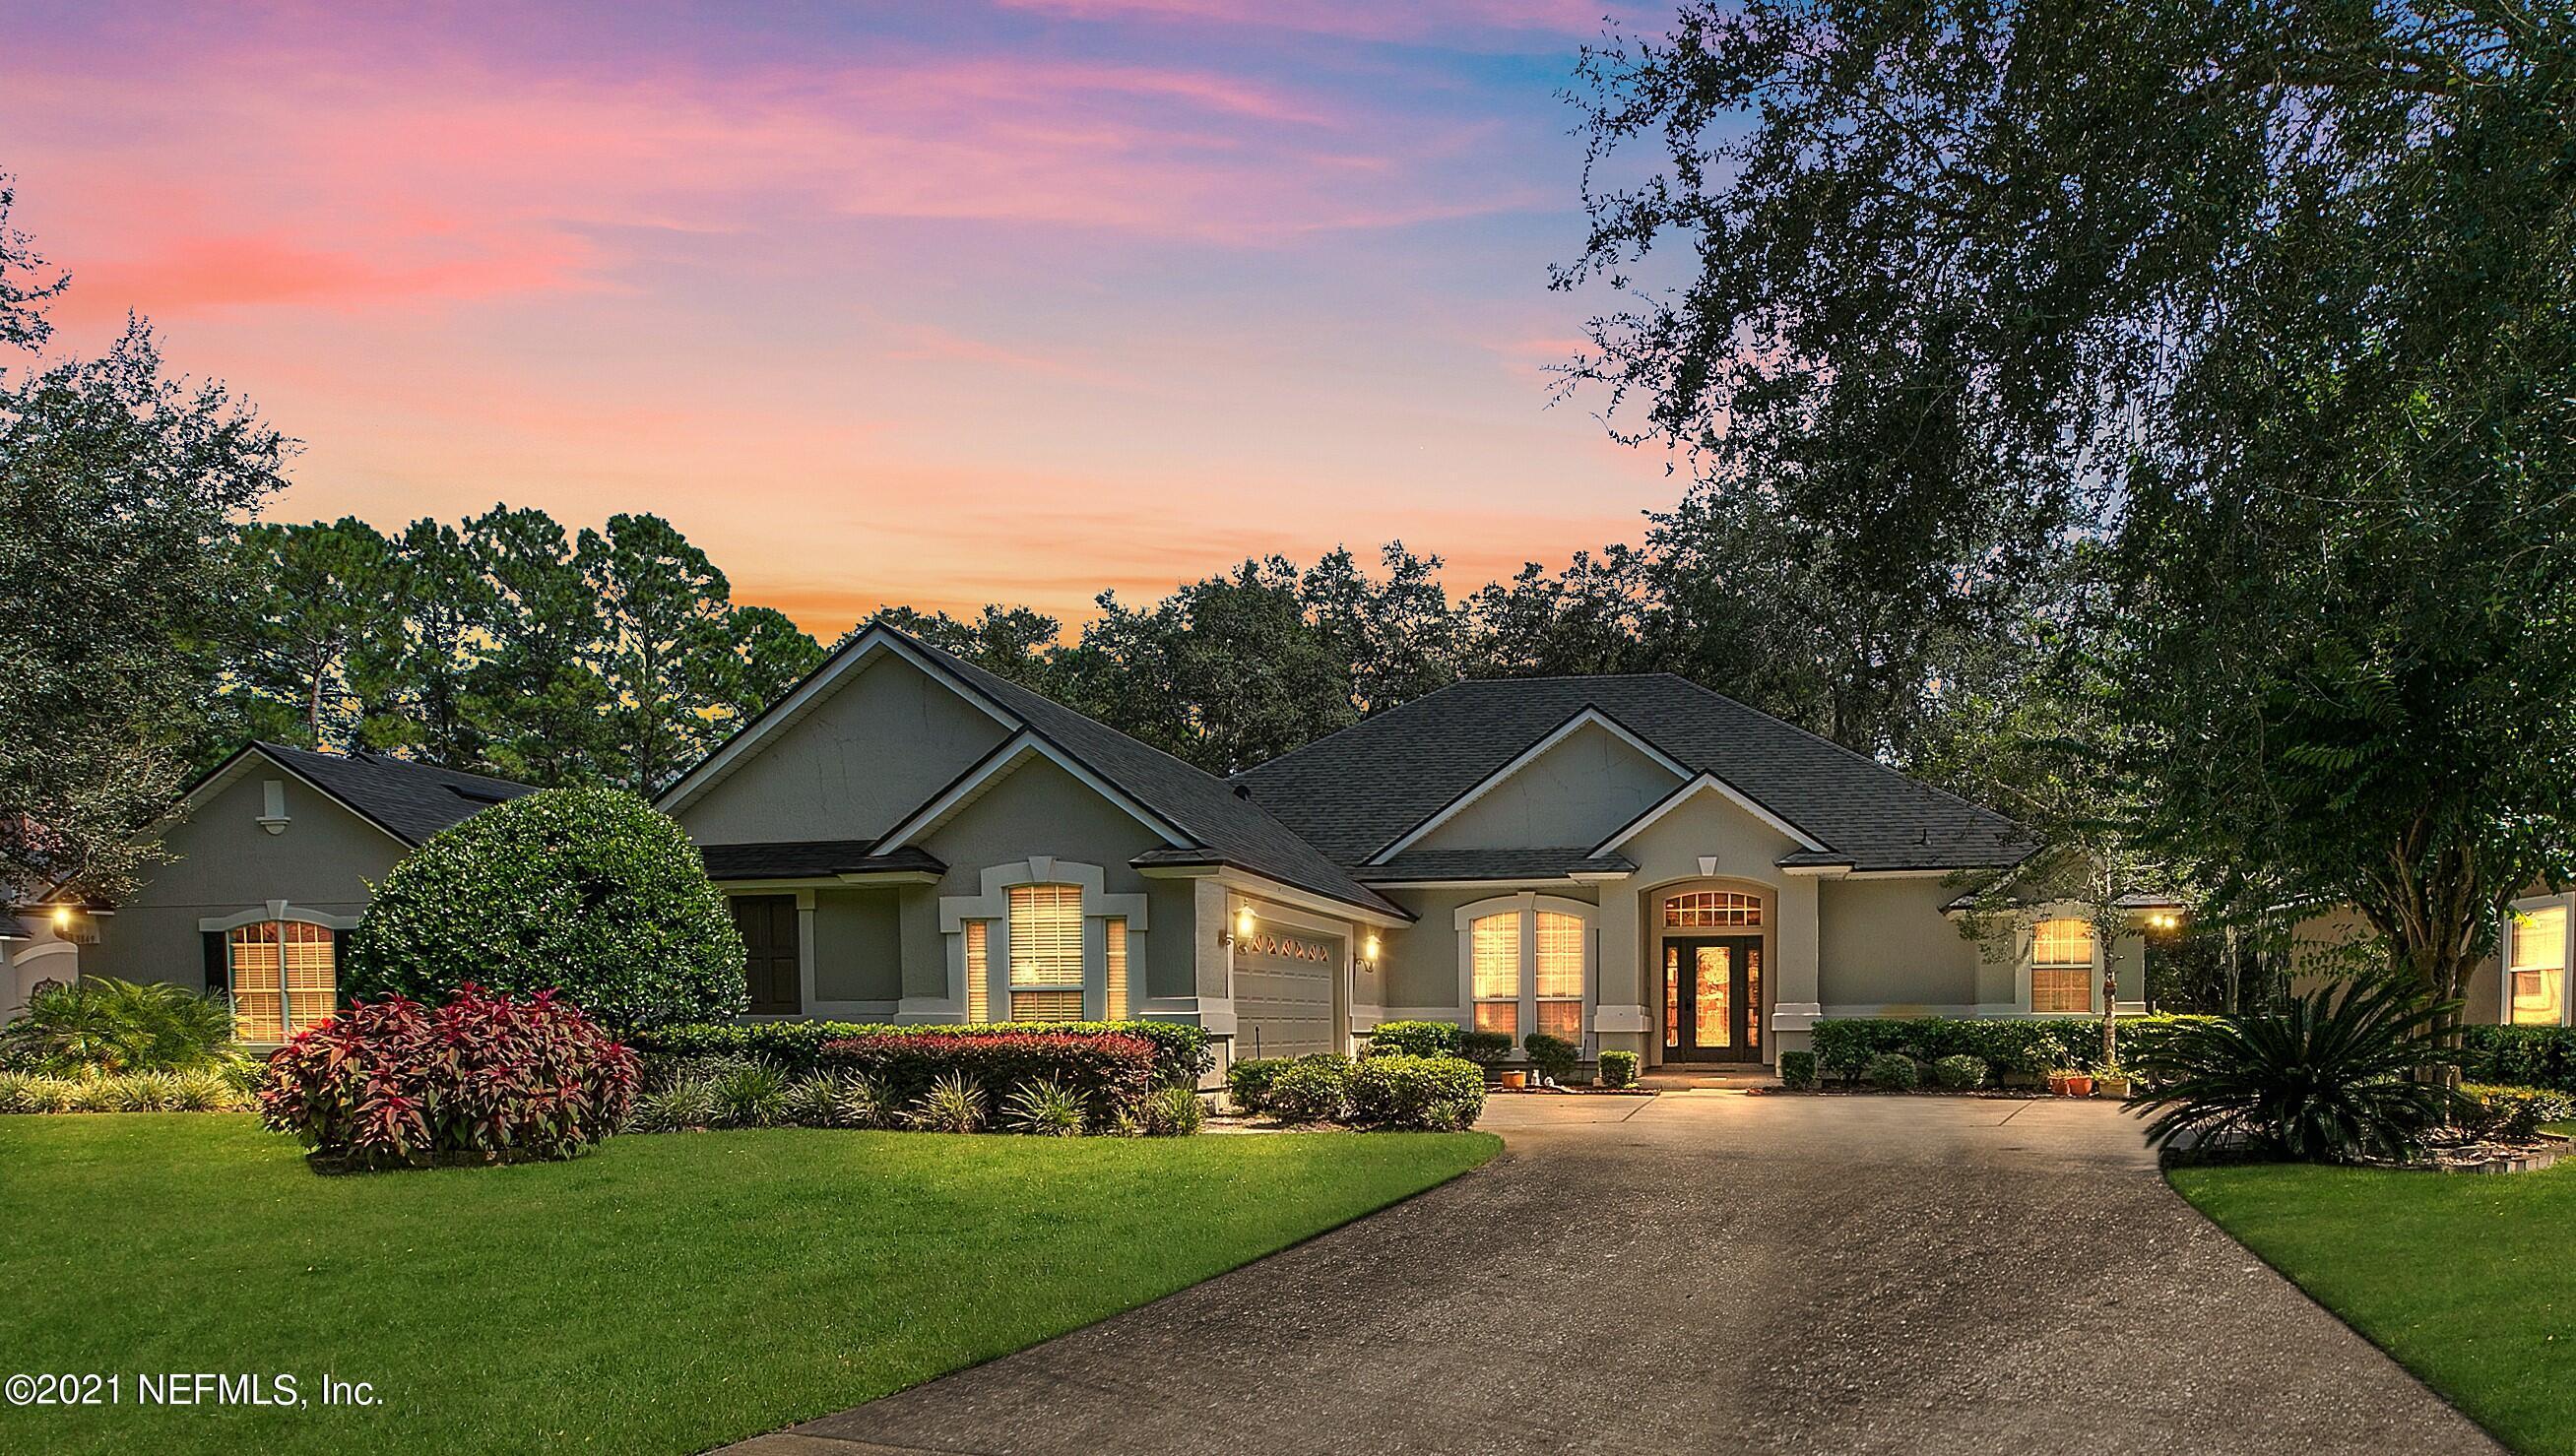 3845 PADDINGTON, ST AUGUSTINE, FLORIDA 32092, 4 Bedrooms Bedrooms, ,3 BathroomsBathrooms,Residential,For sale,PADDINGTON,1131832